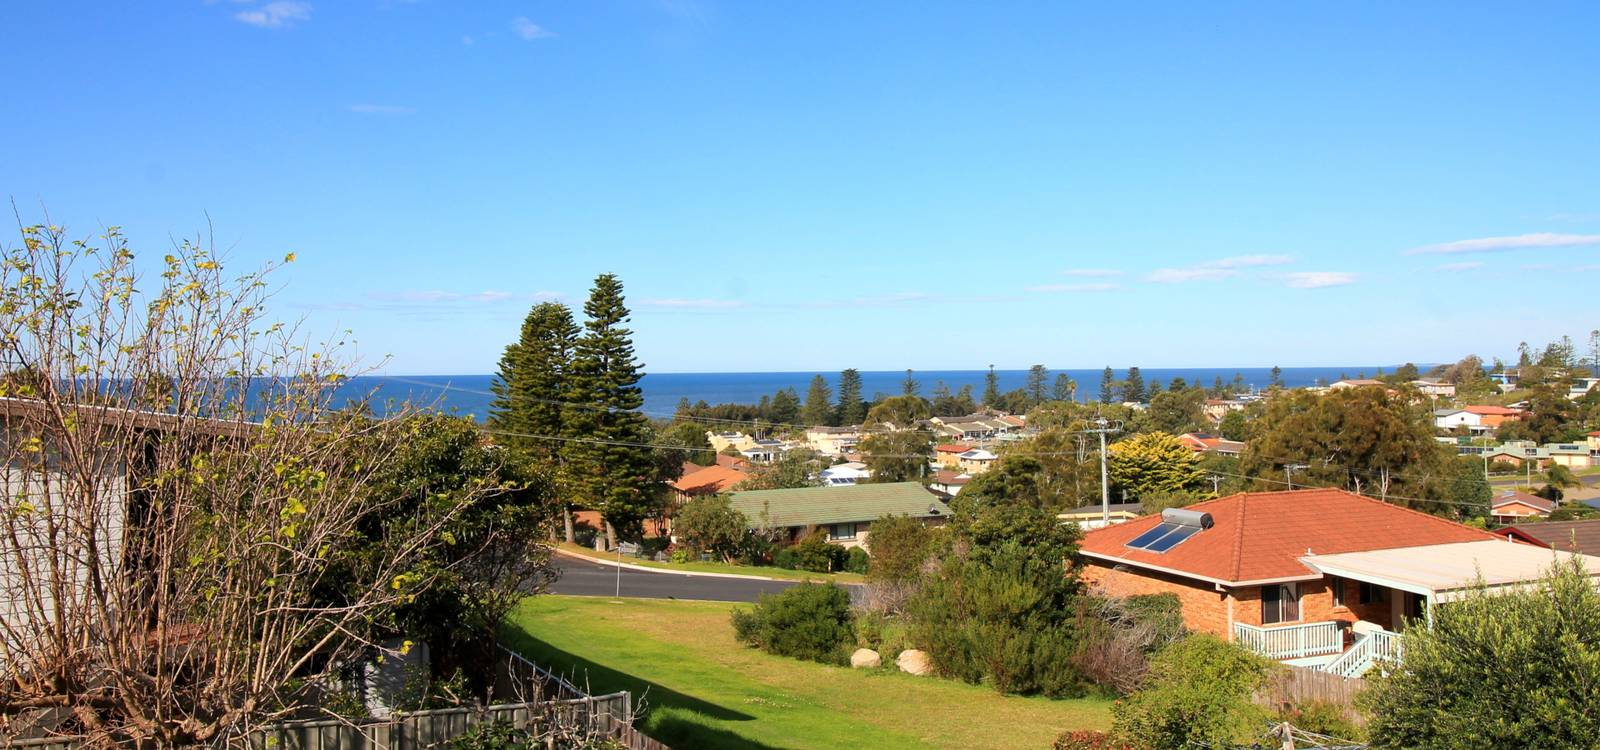 26 Swordfish Street TUROSS HEAD, NSW 2537 - photo 1